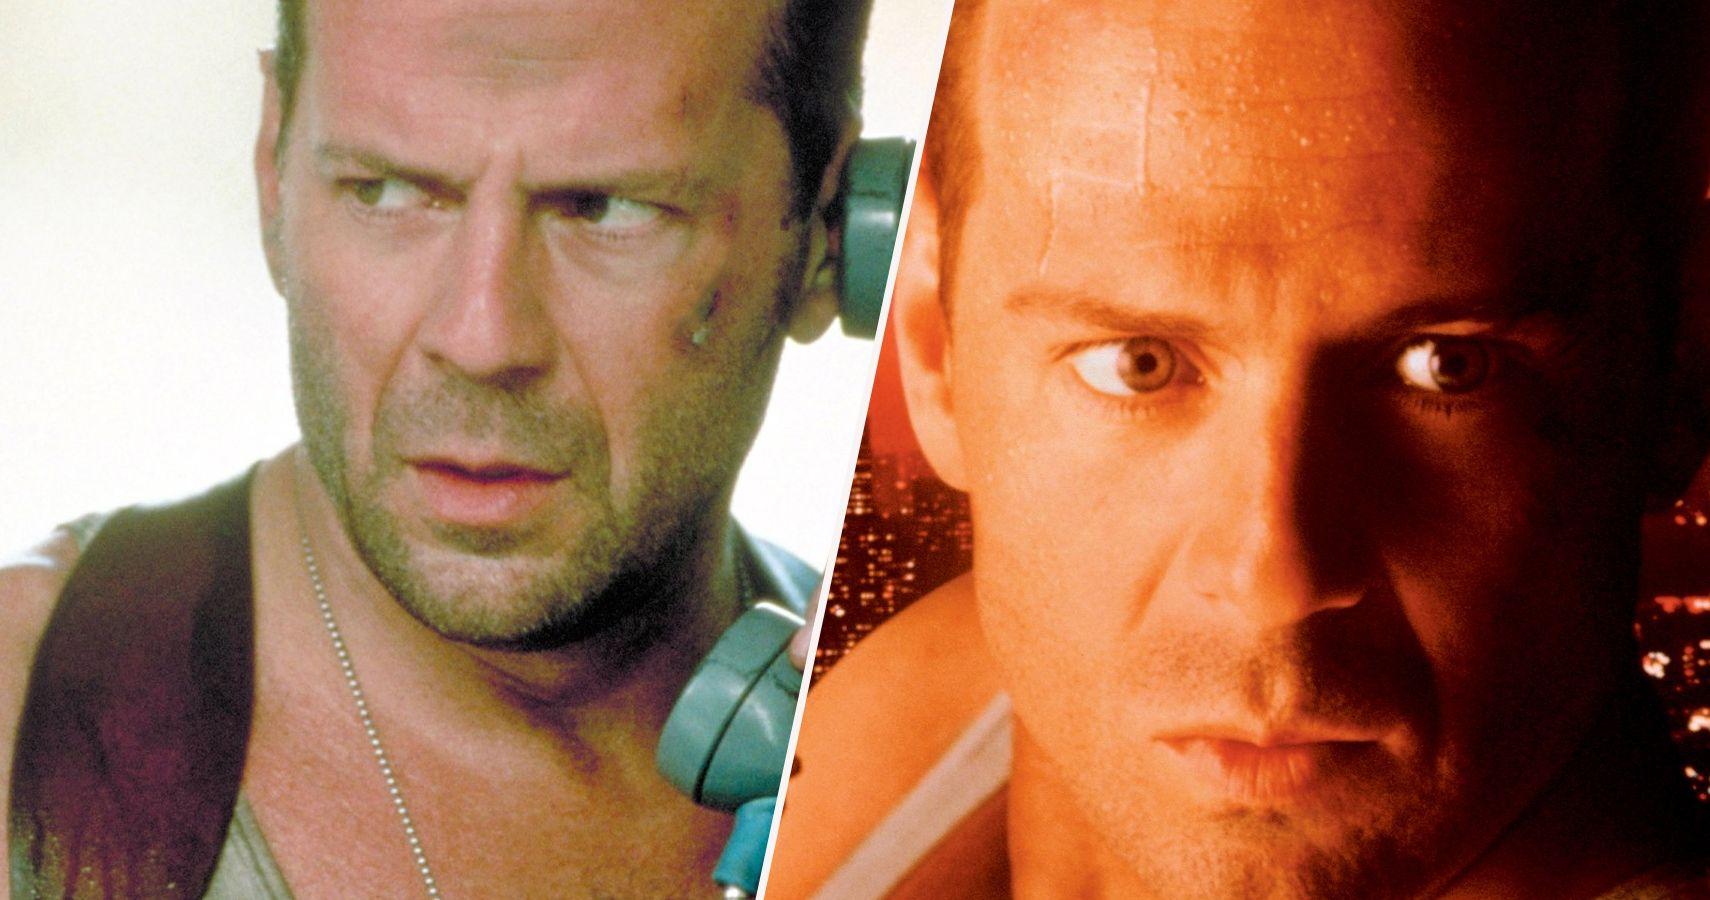 20 Little Details Behind The Making Of Die Hard